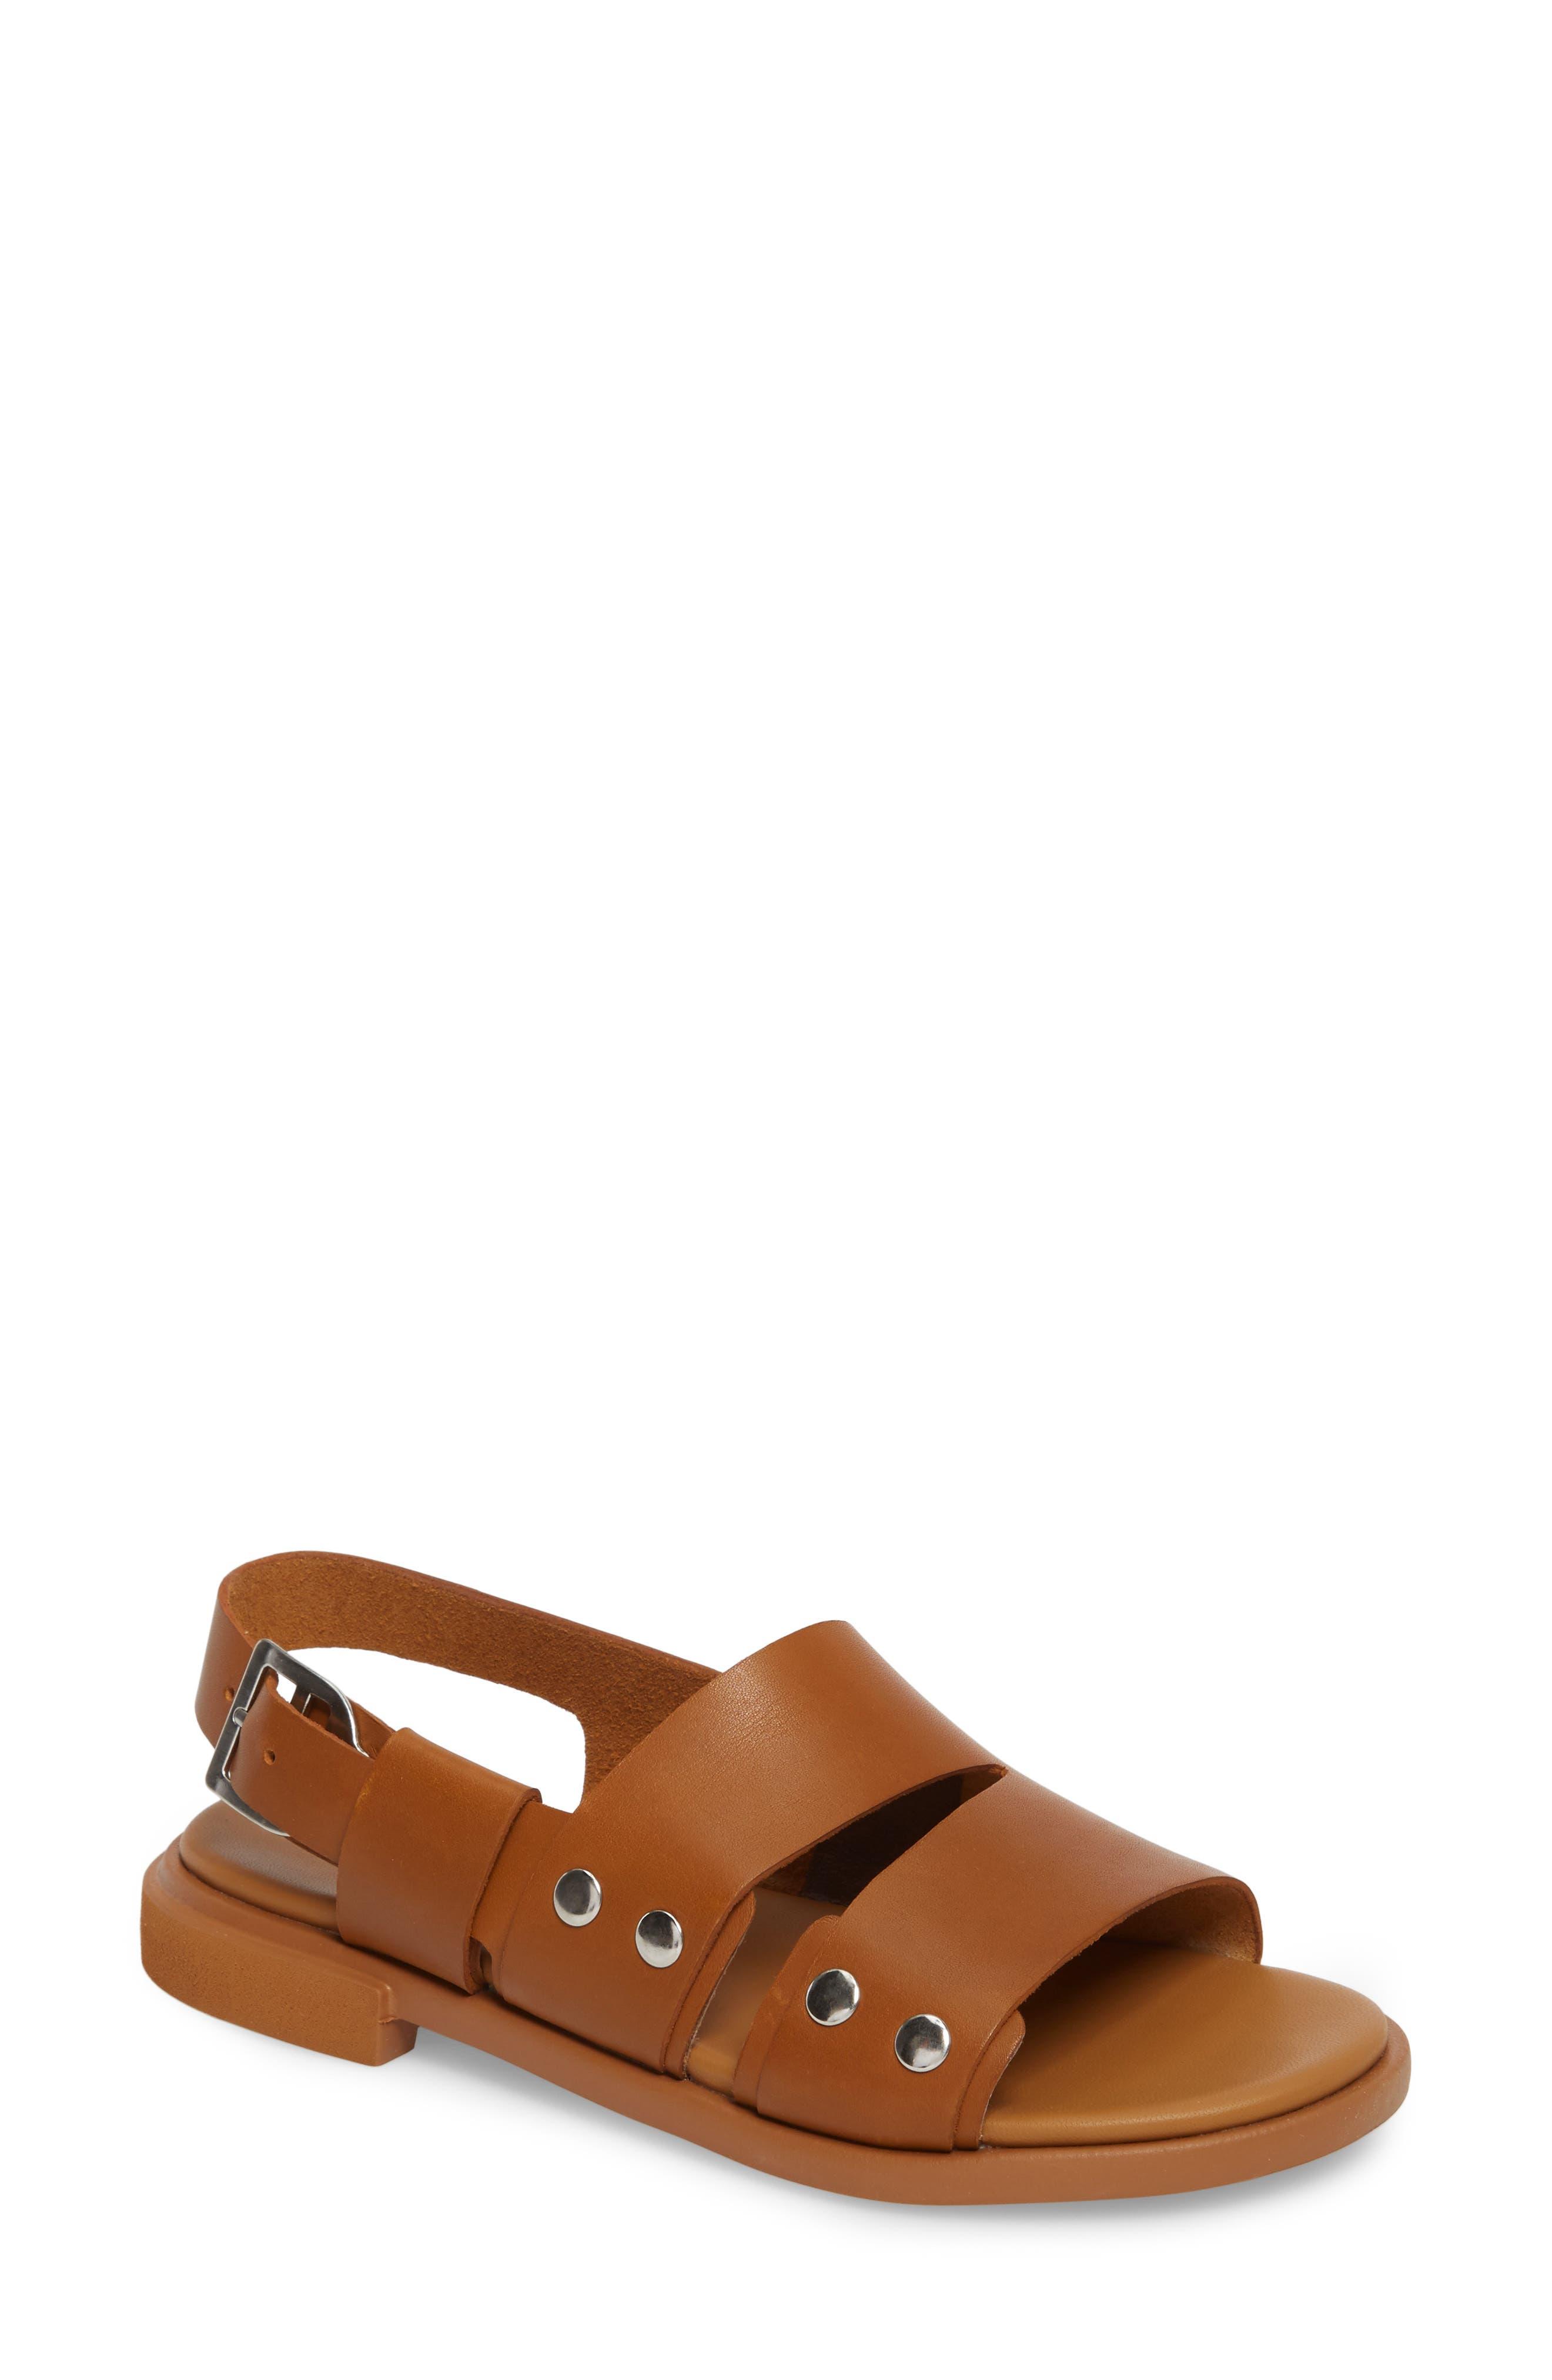 Edy Slingback Sandal,                             Main thumbnail 1, color,                             Rust/ Copper Leather